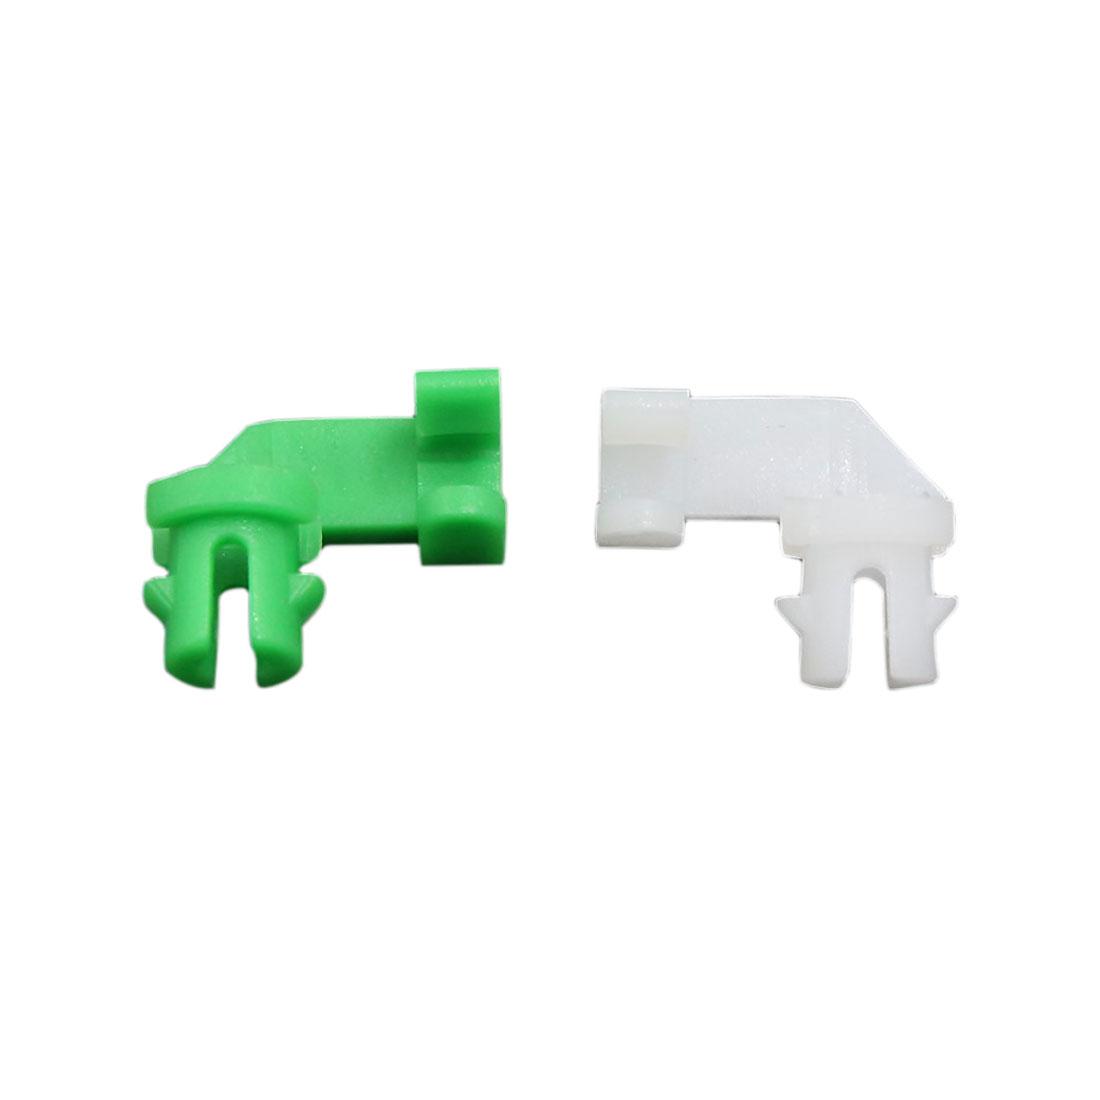 20pcs White Green Dual Colors Plastic Rivet Trim Fastener Moulding Clips for Car